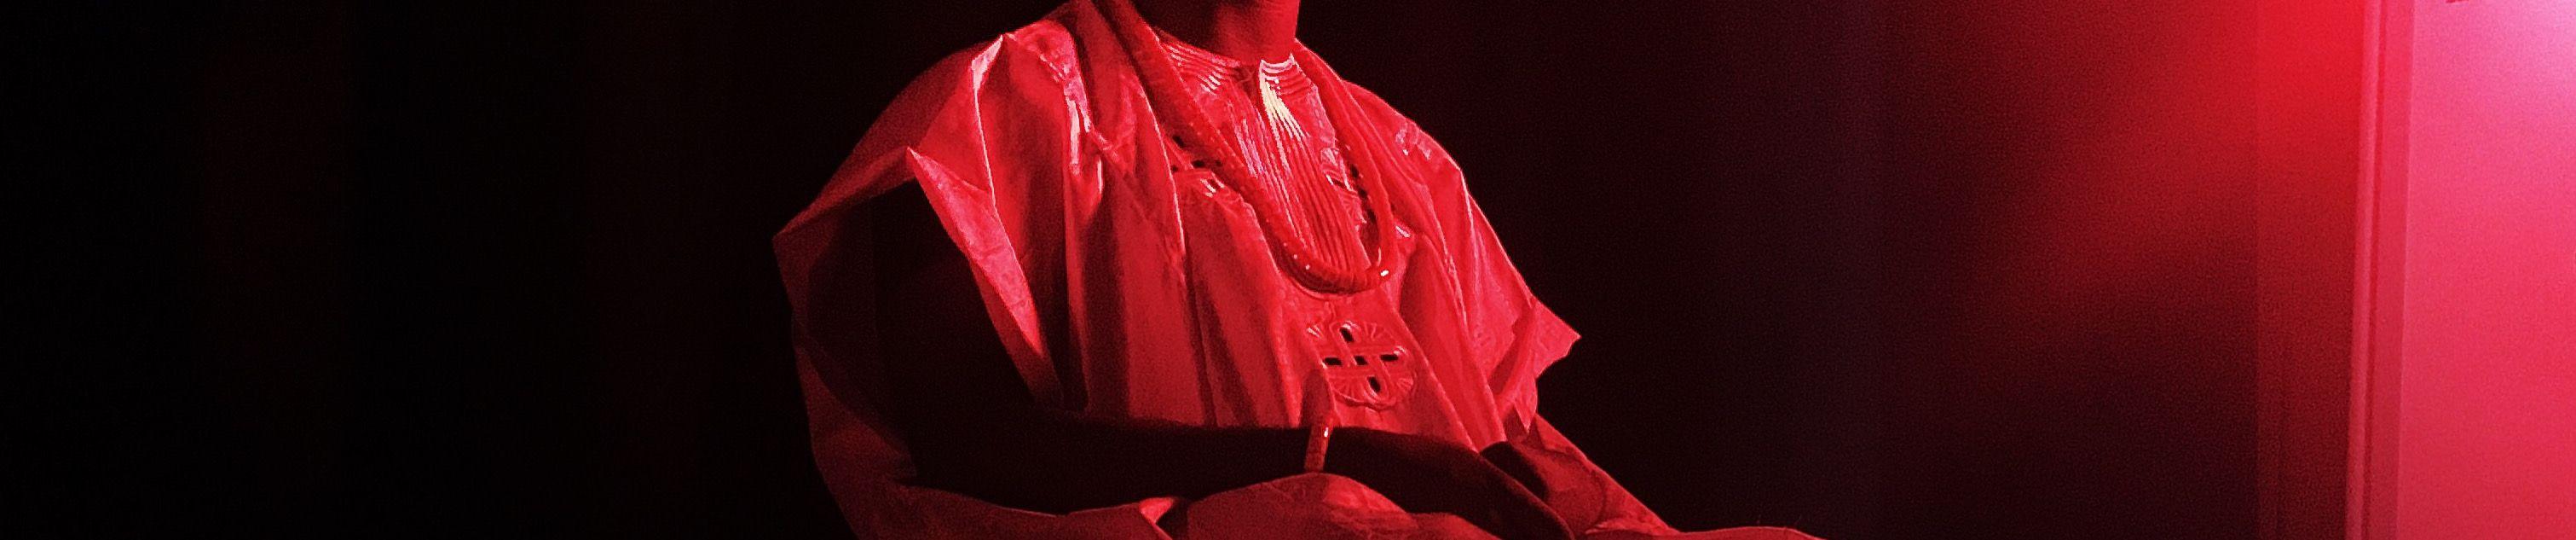 Zizibo - Gospel Afrobeat Acapella Freestyle by Zizibo | Free